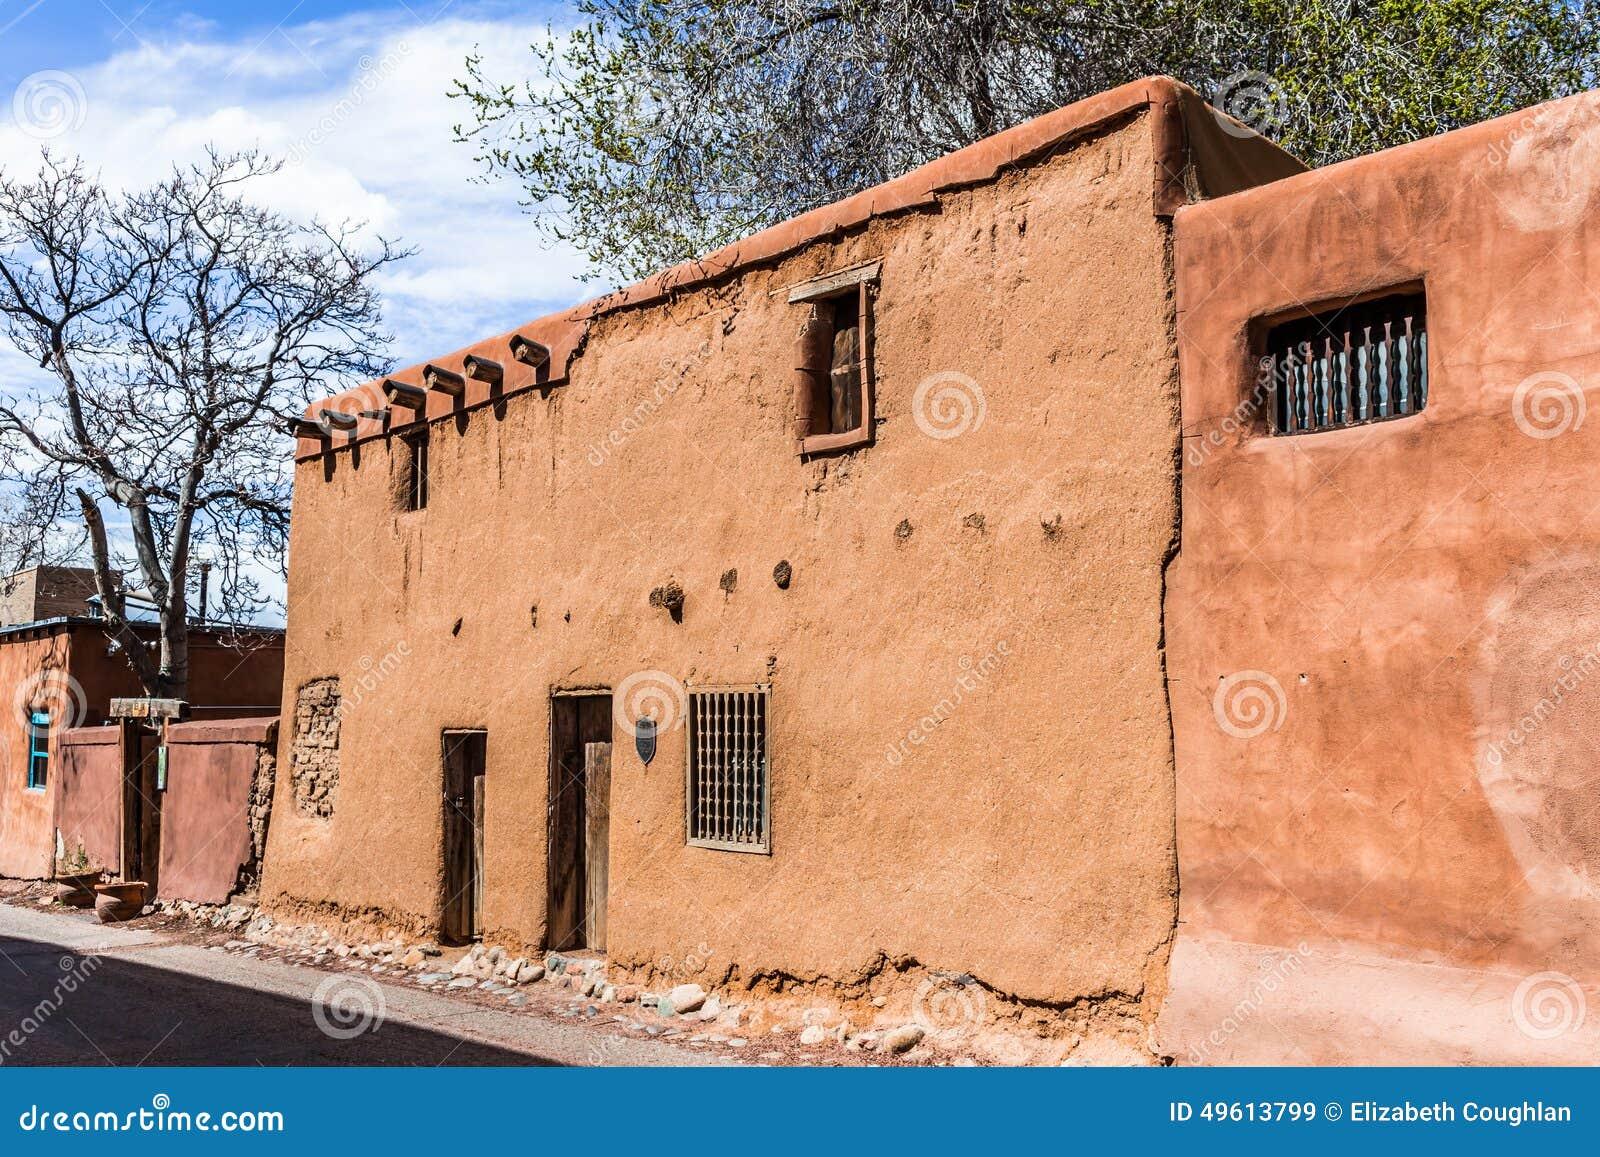 Old adobe house santa fe new mexico usa stock image for Santa fe adobe homes